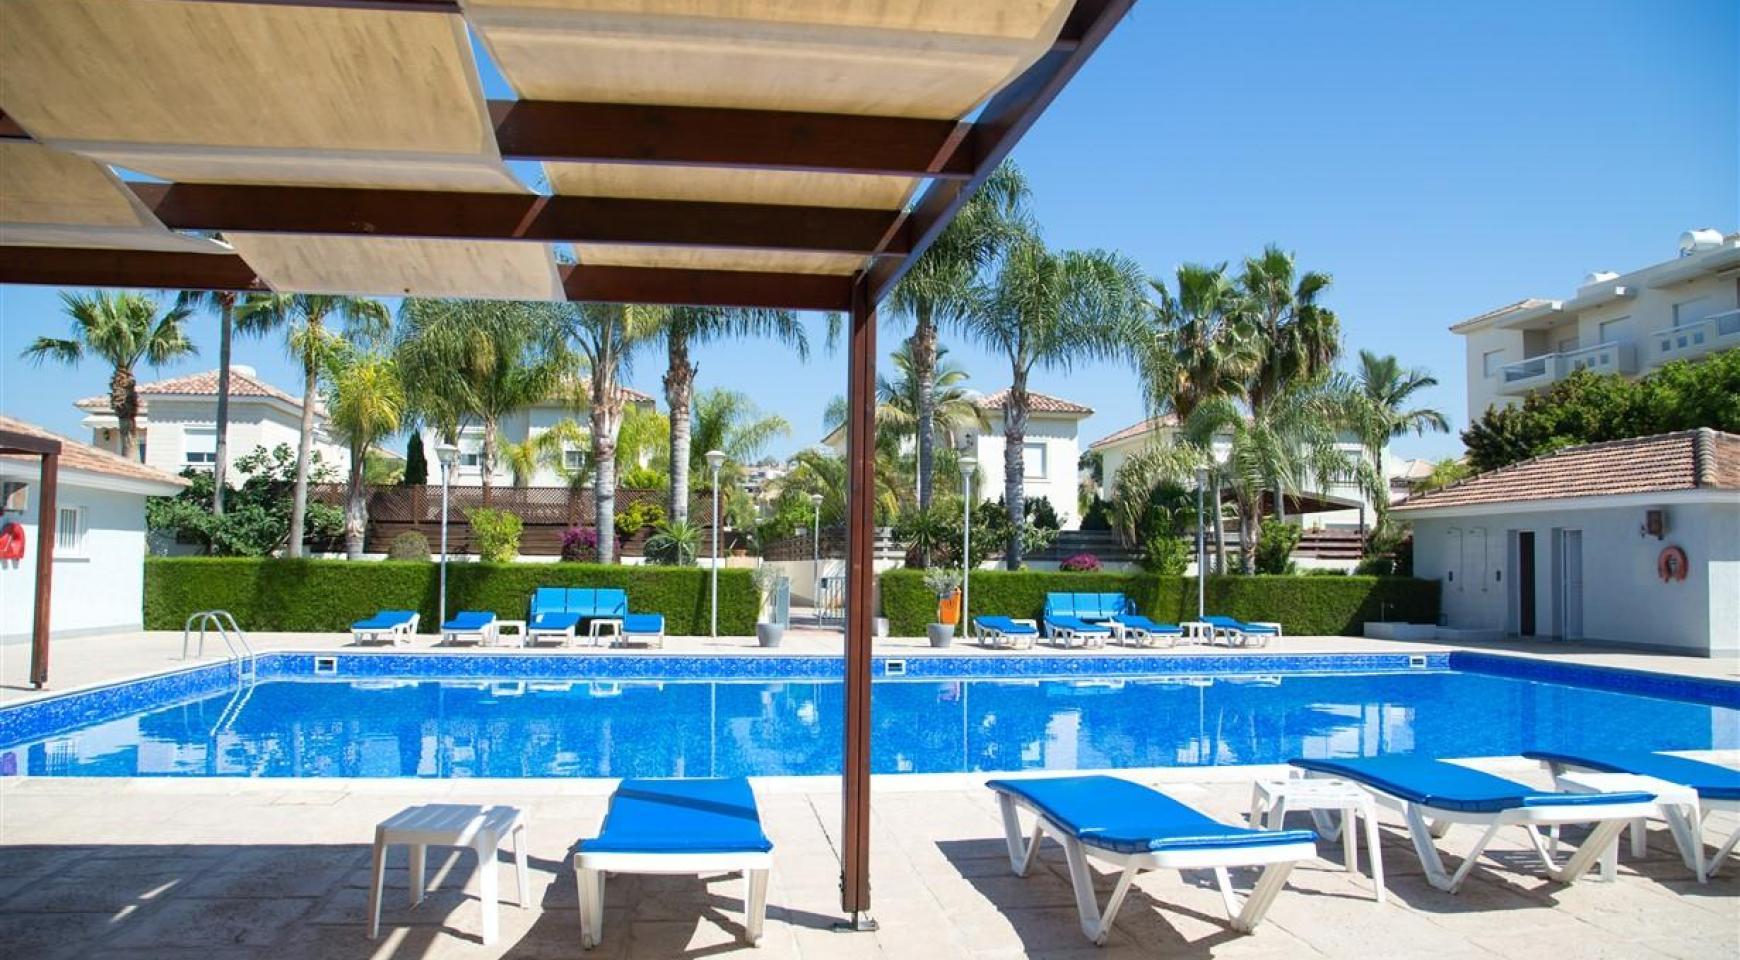 2 Bedroom Apartment Mesogios Iris 304 in the Complex near the Sea - 27